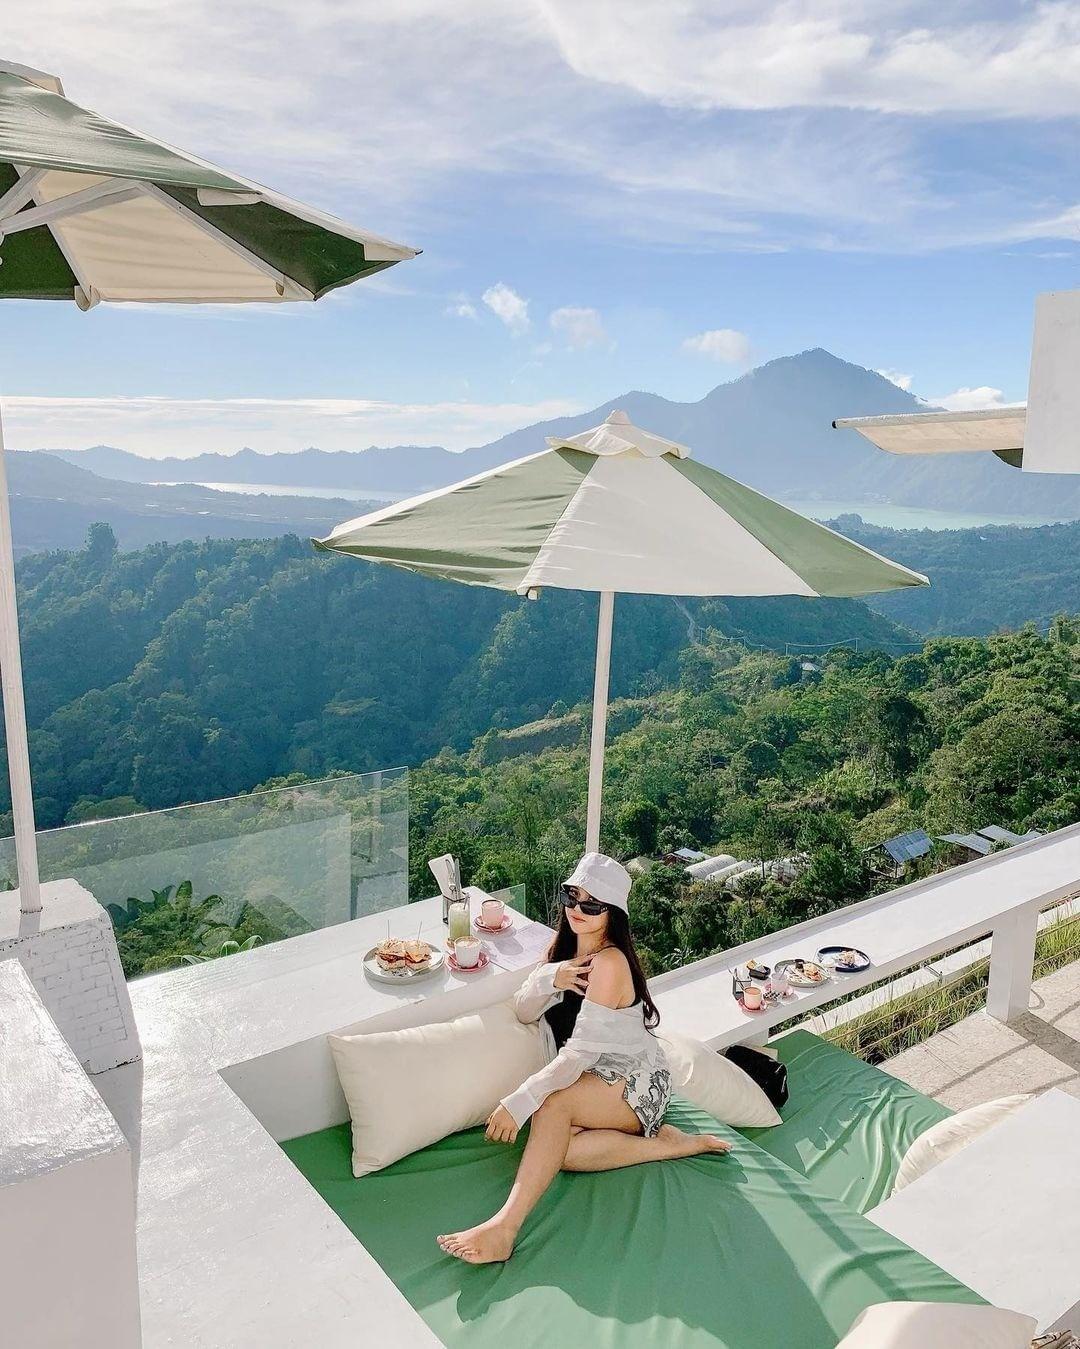 Foto Di Paperhills Cafe Bali Image From @itadesilia